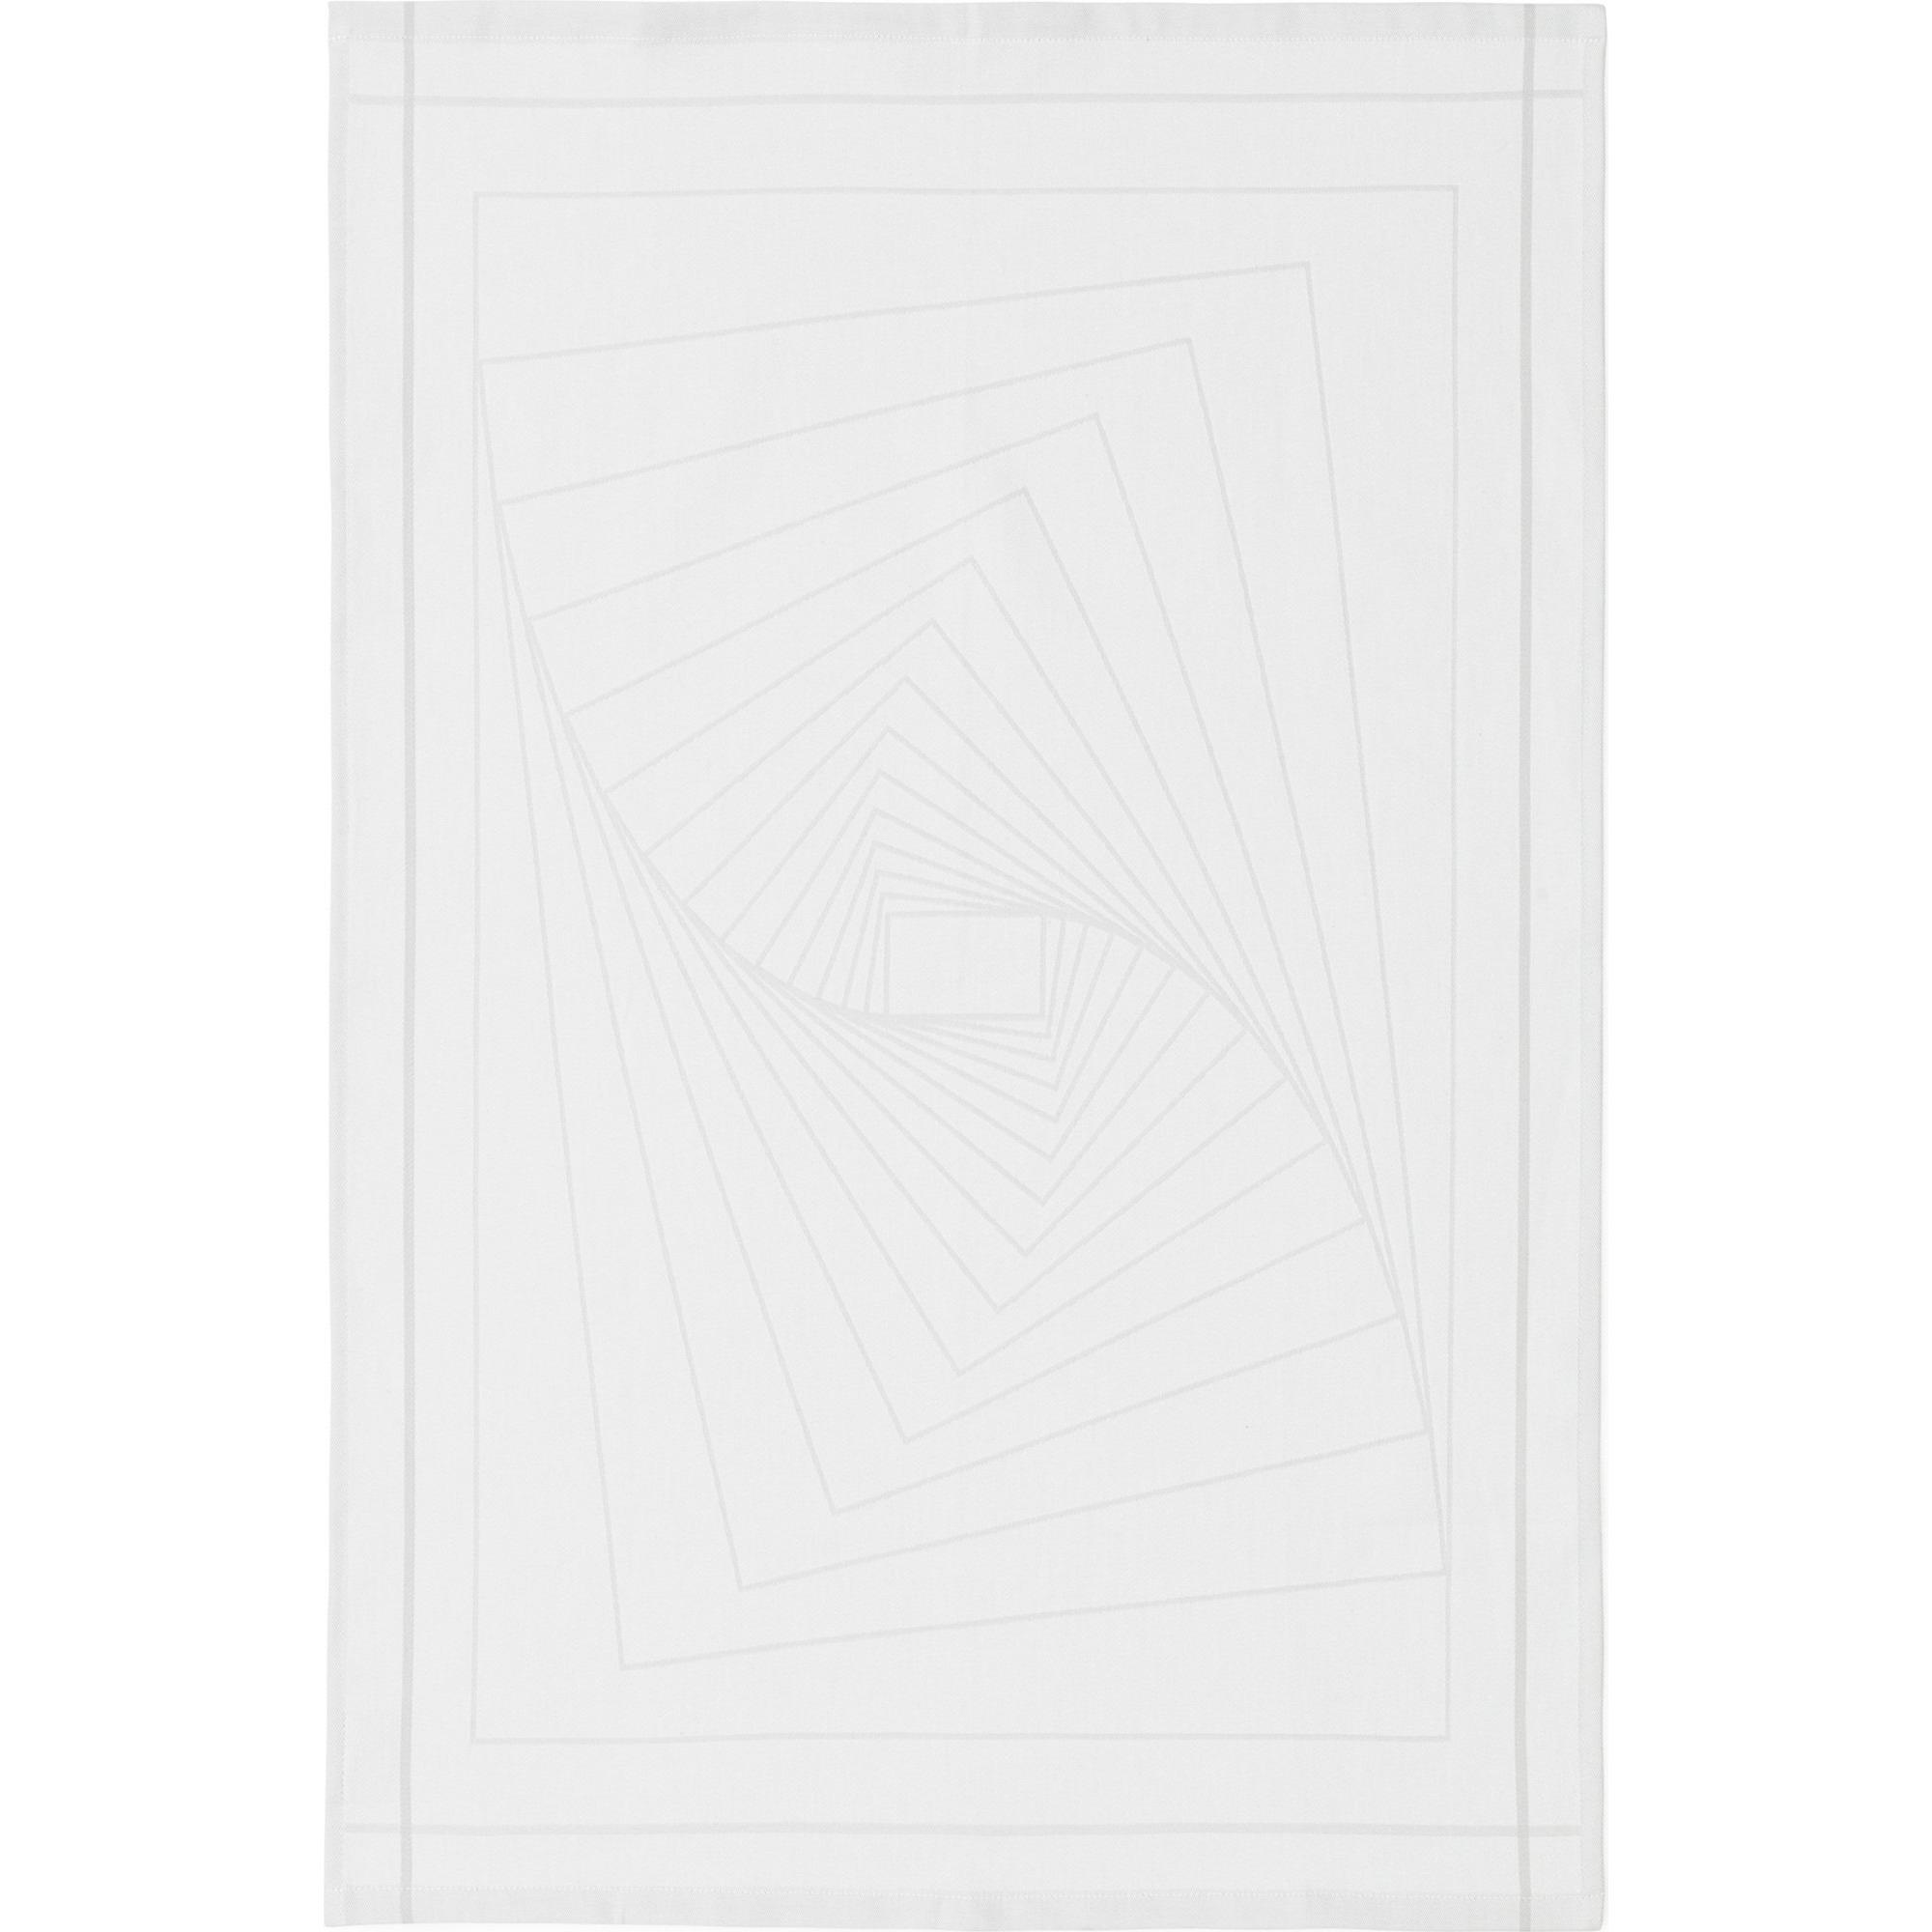 Normann Copenhagen Illusion Tea Towel White